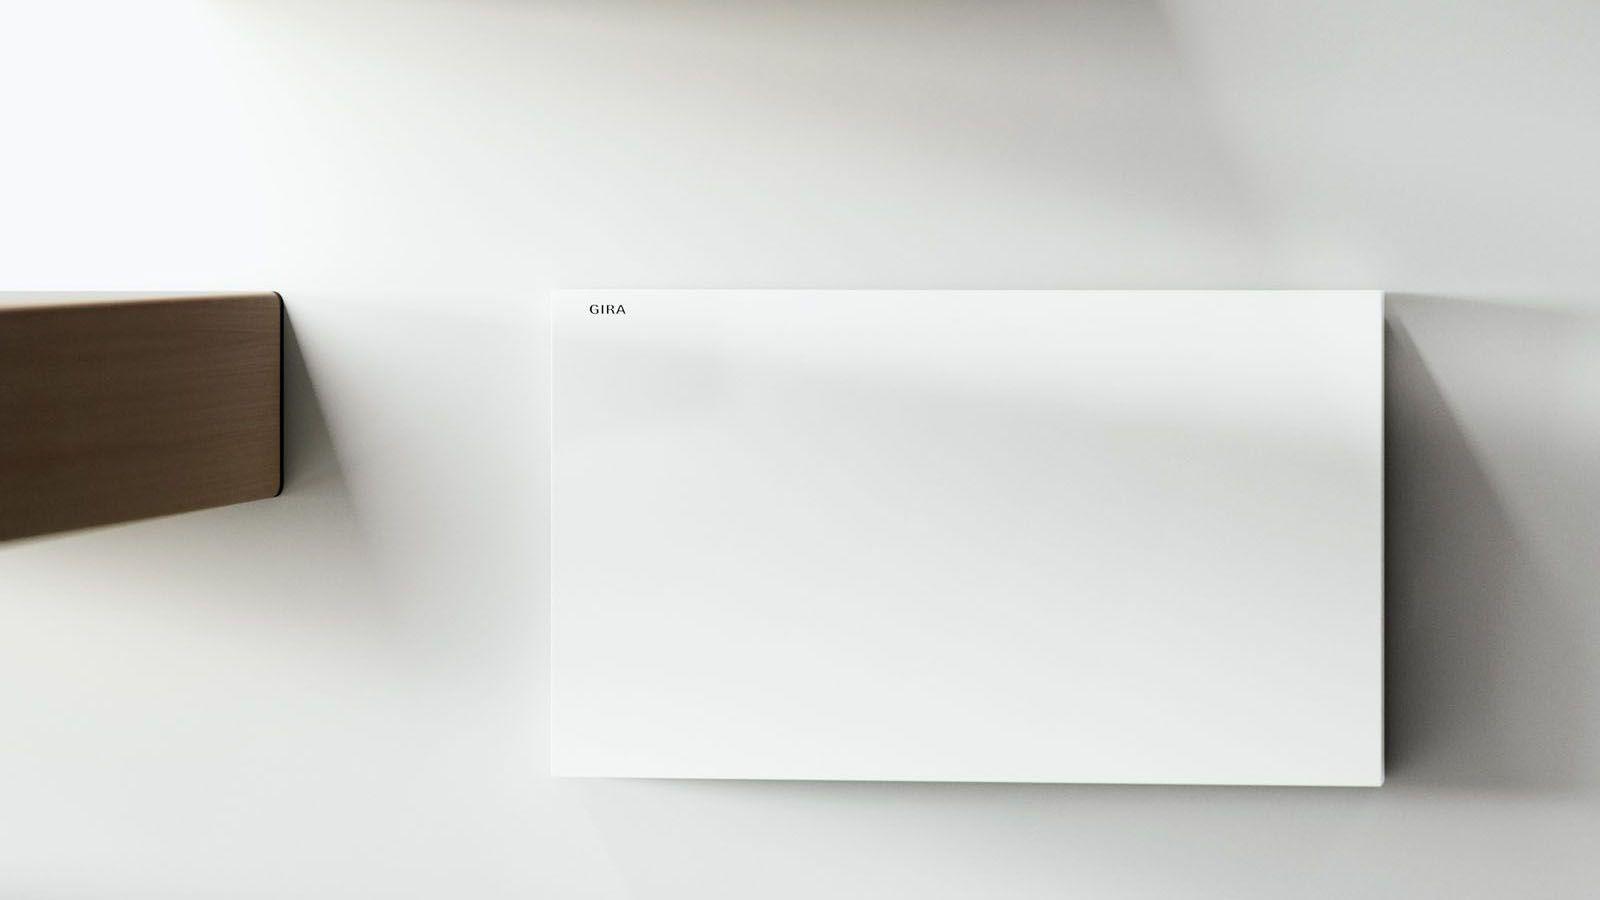 Gira Alarm Connect Zentrale